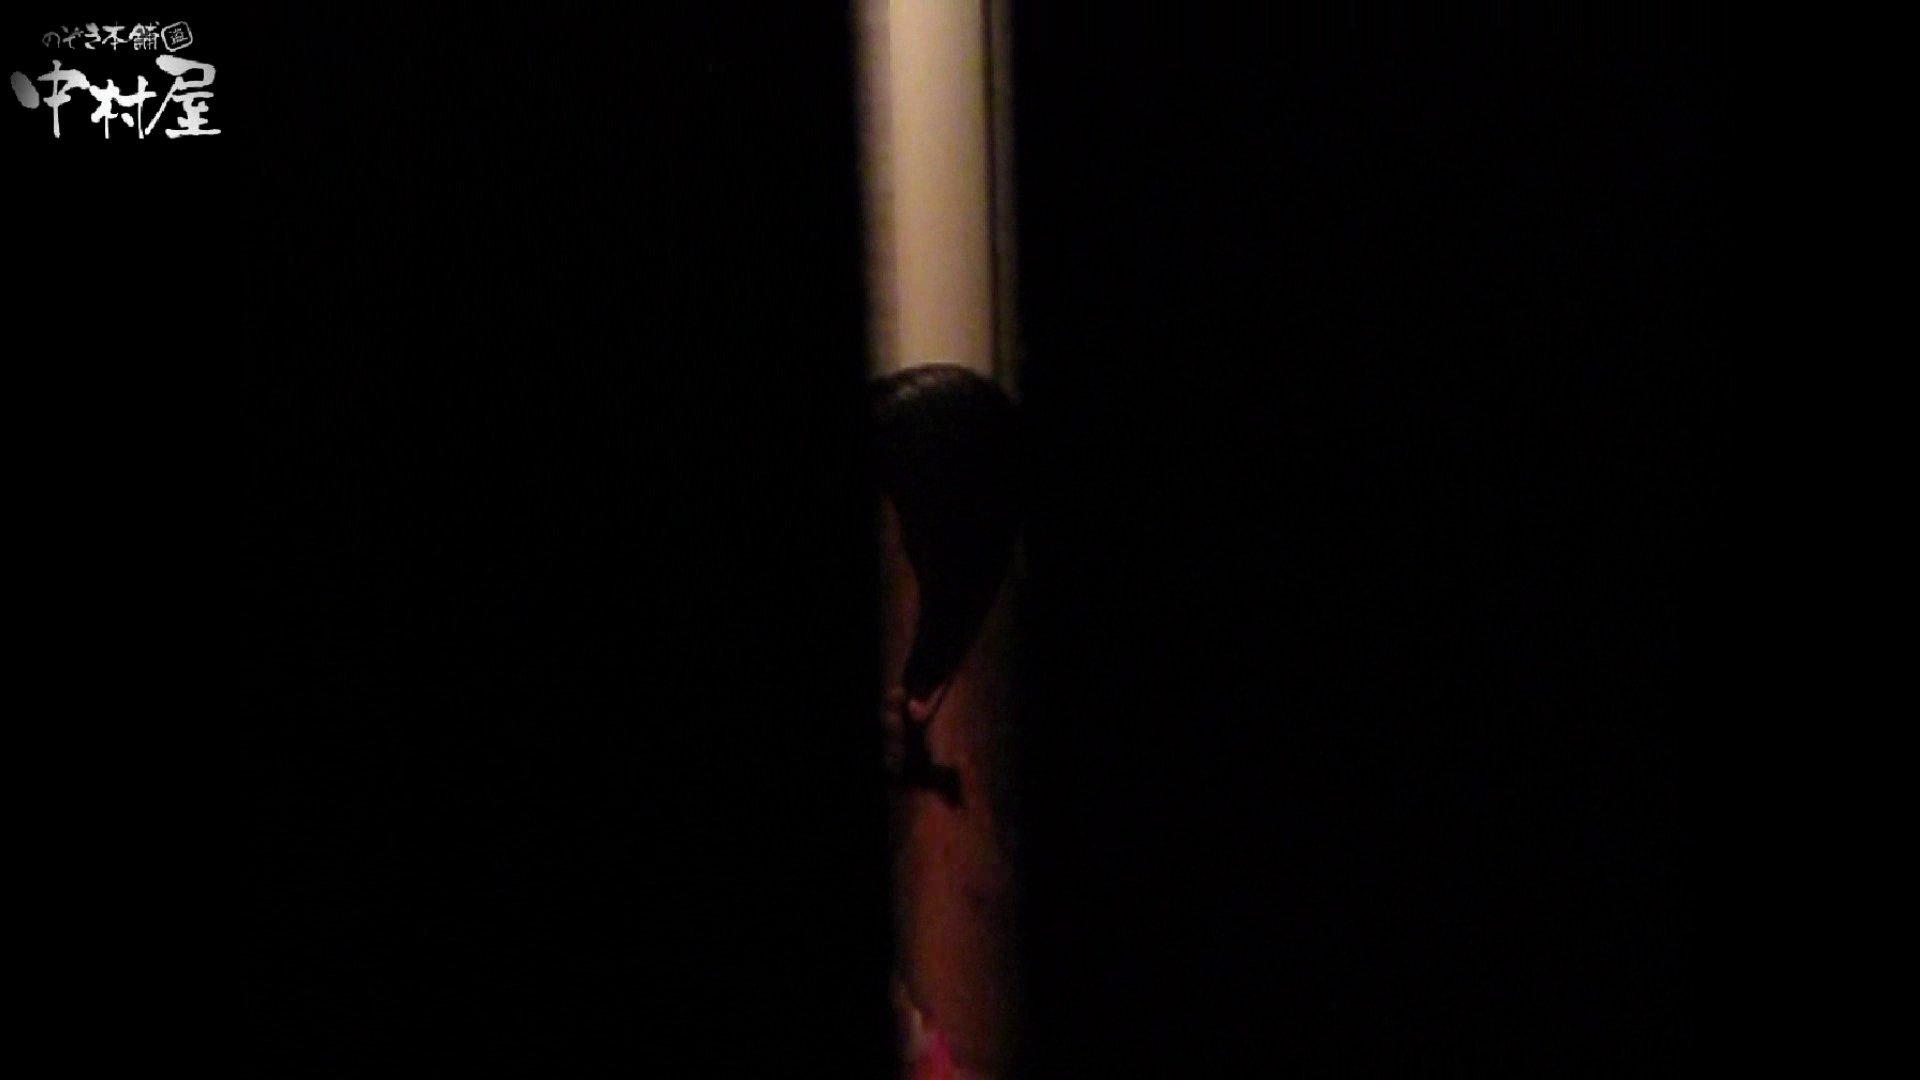 民家風呂専門盗撮師の超危険映像 vol.004 盗撮 えろ無修正画像 99連発 51